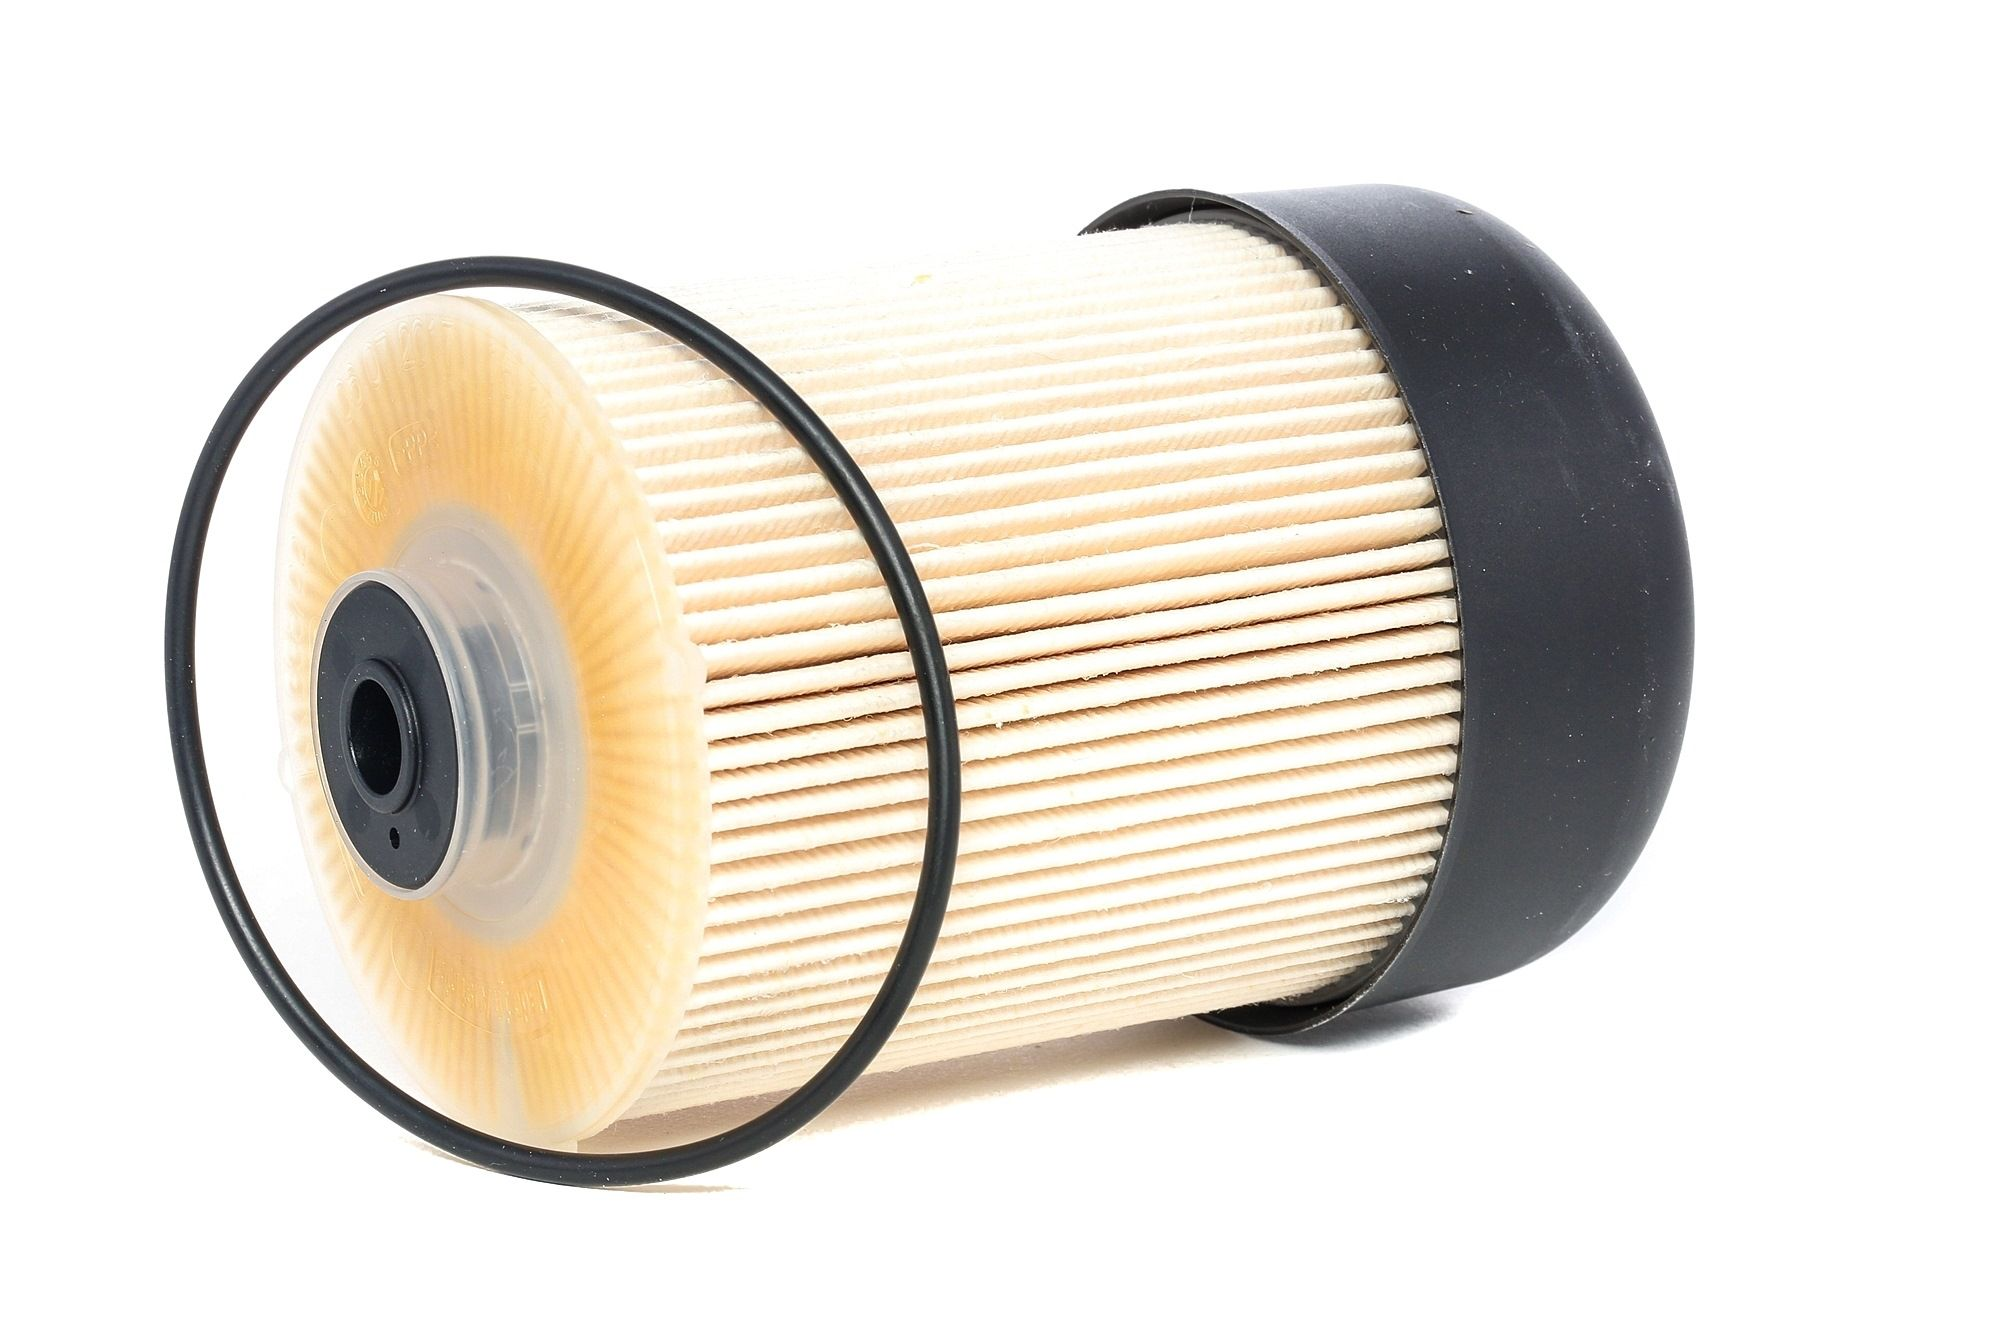 Original Palivový filtr KX 338/22D Mercedes